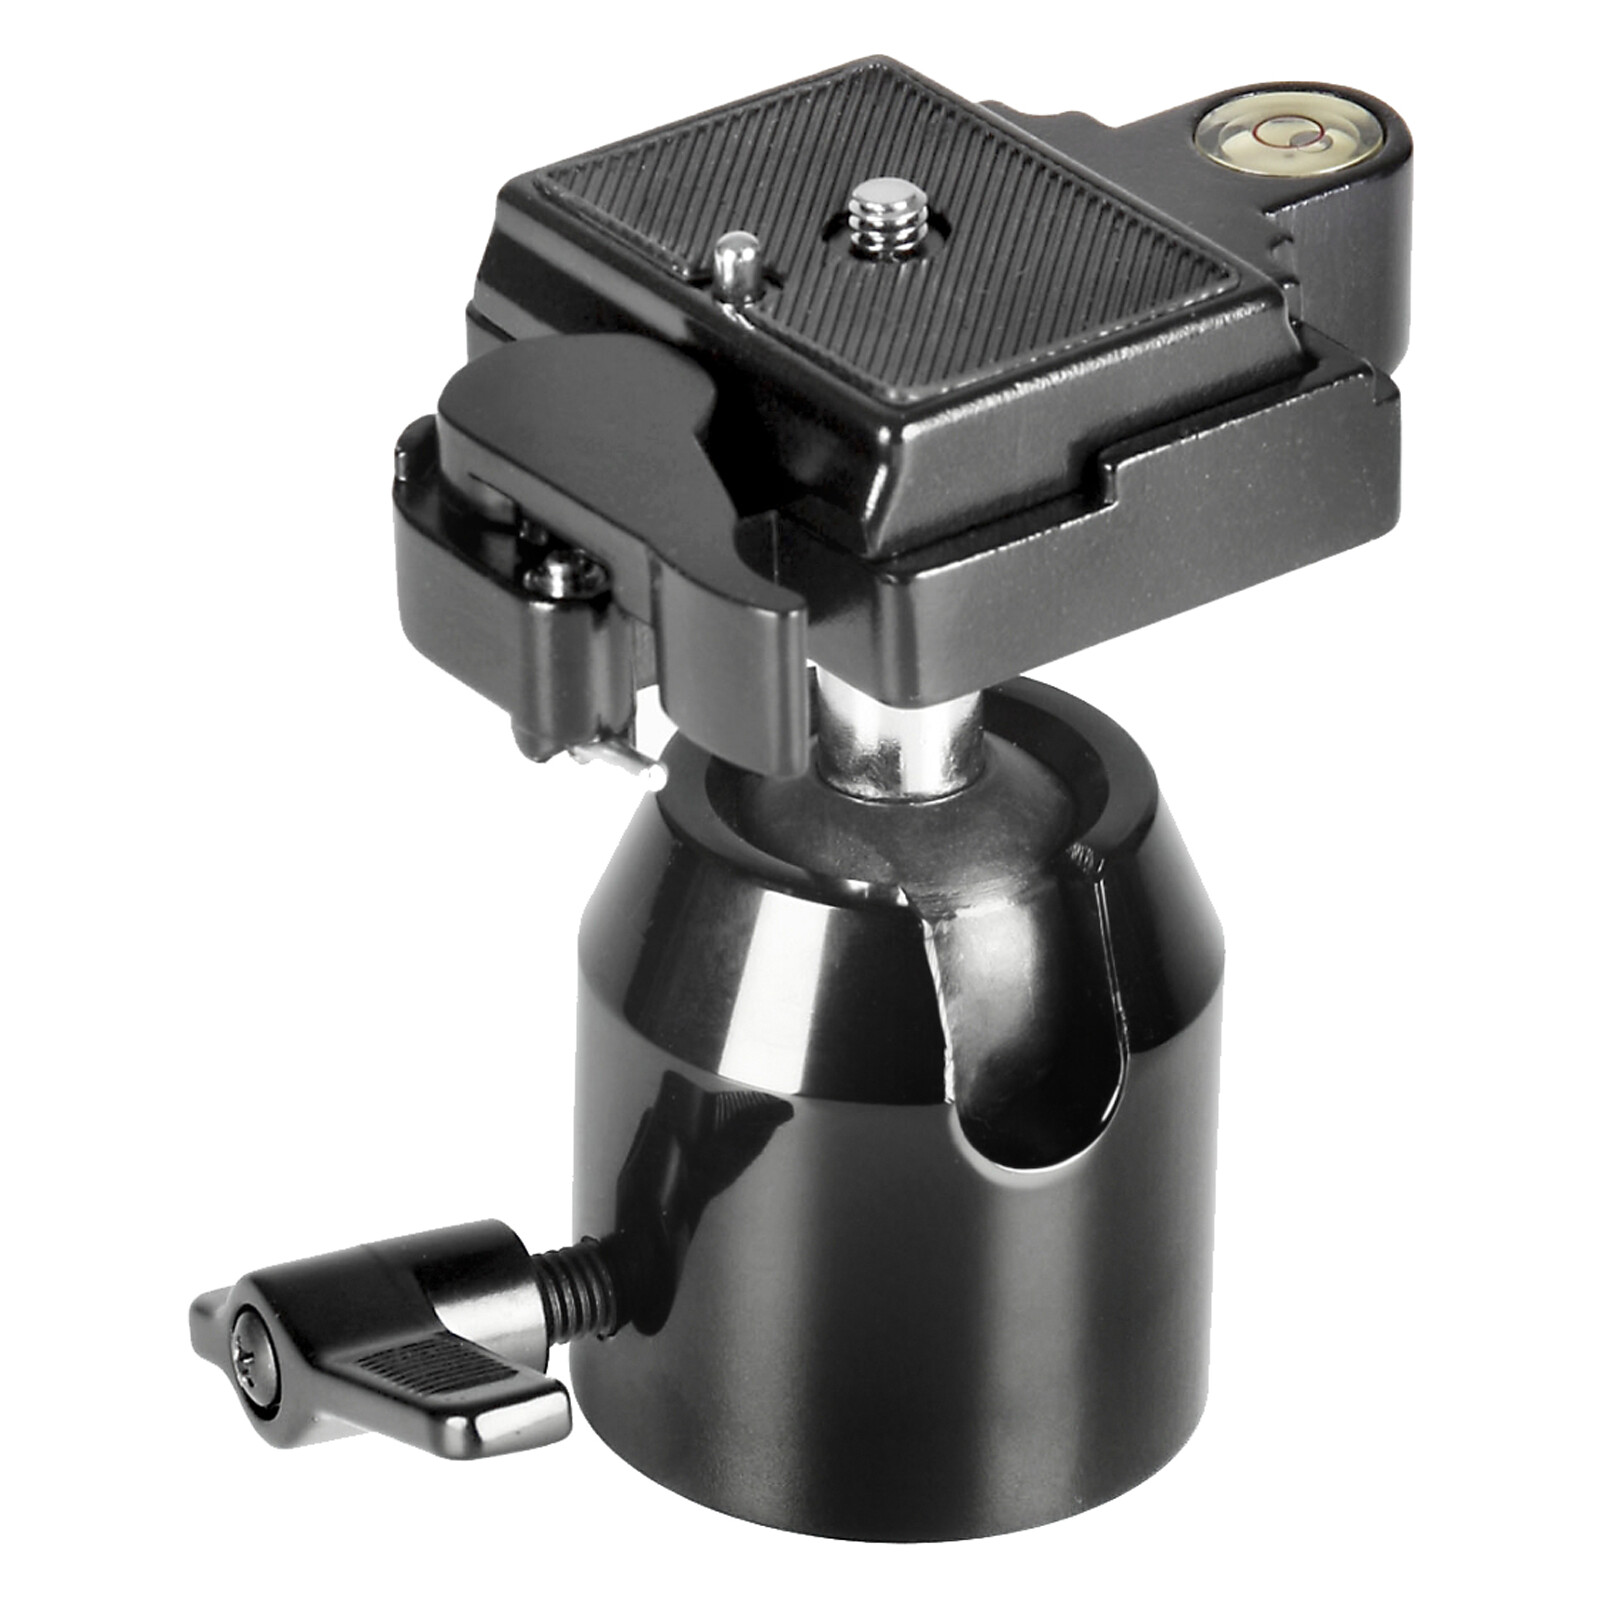 walimex FT-002H Pro-Kugelkopf